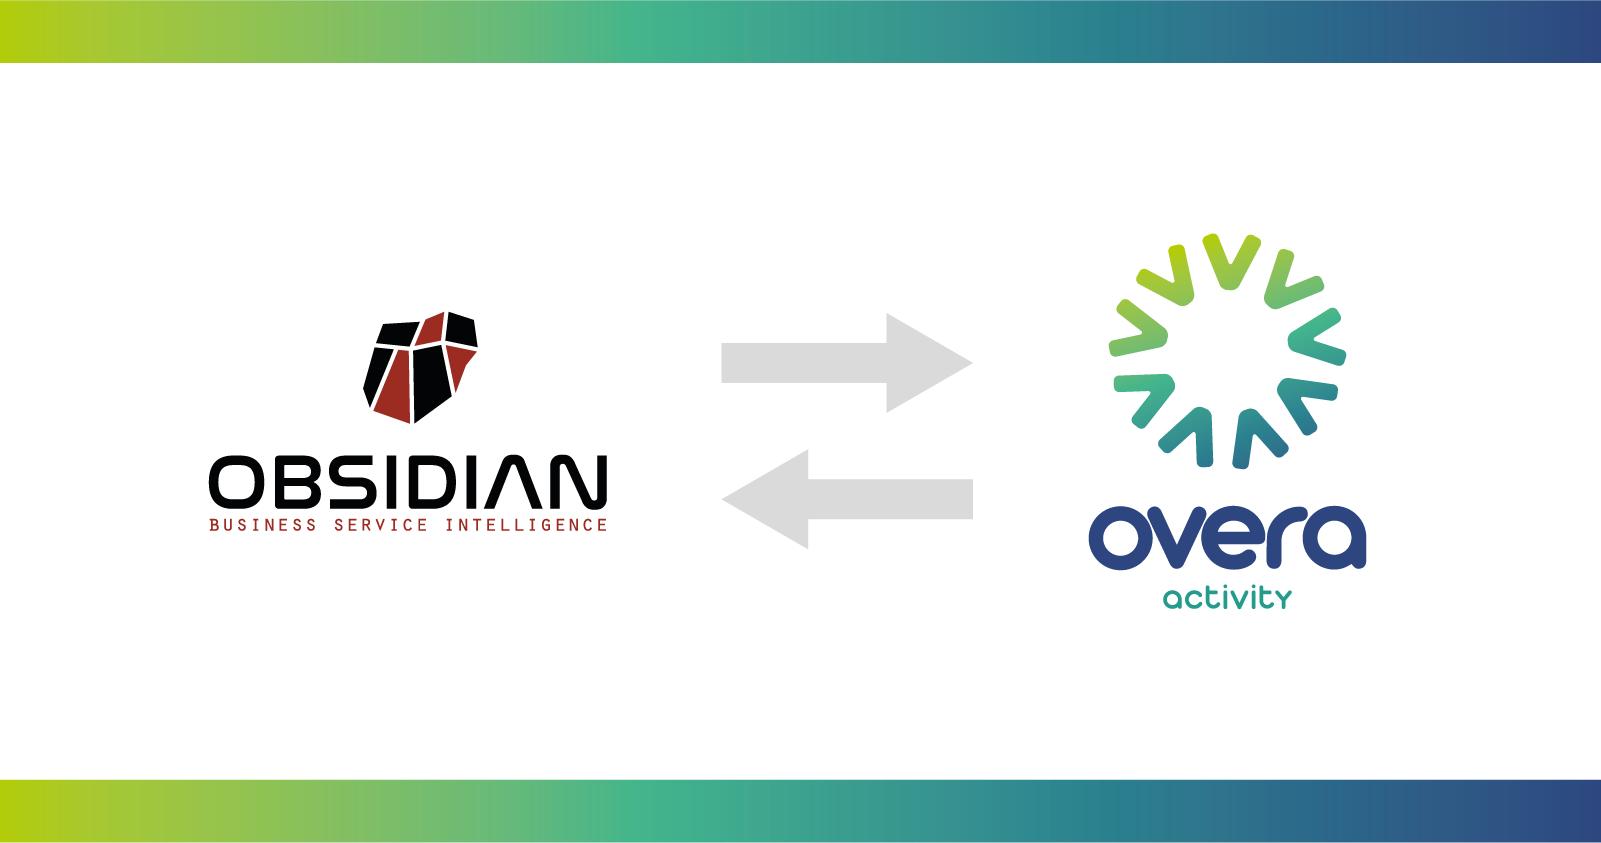 Integración de Obsidian con Overa Activity